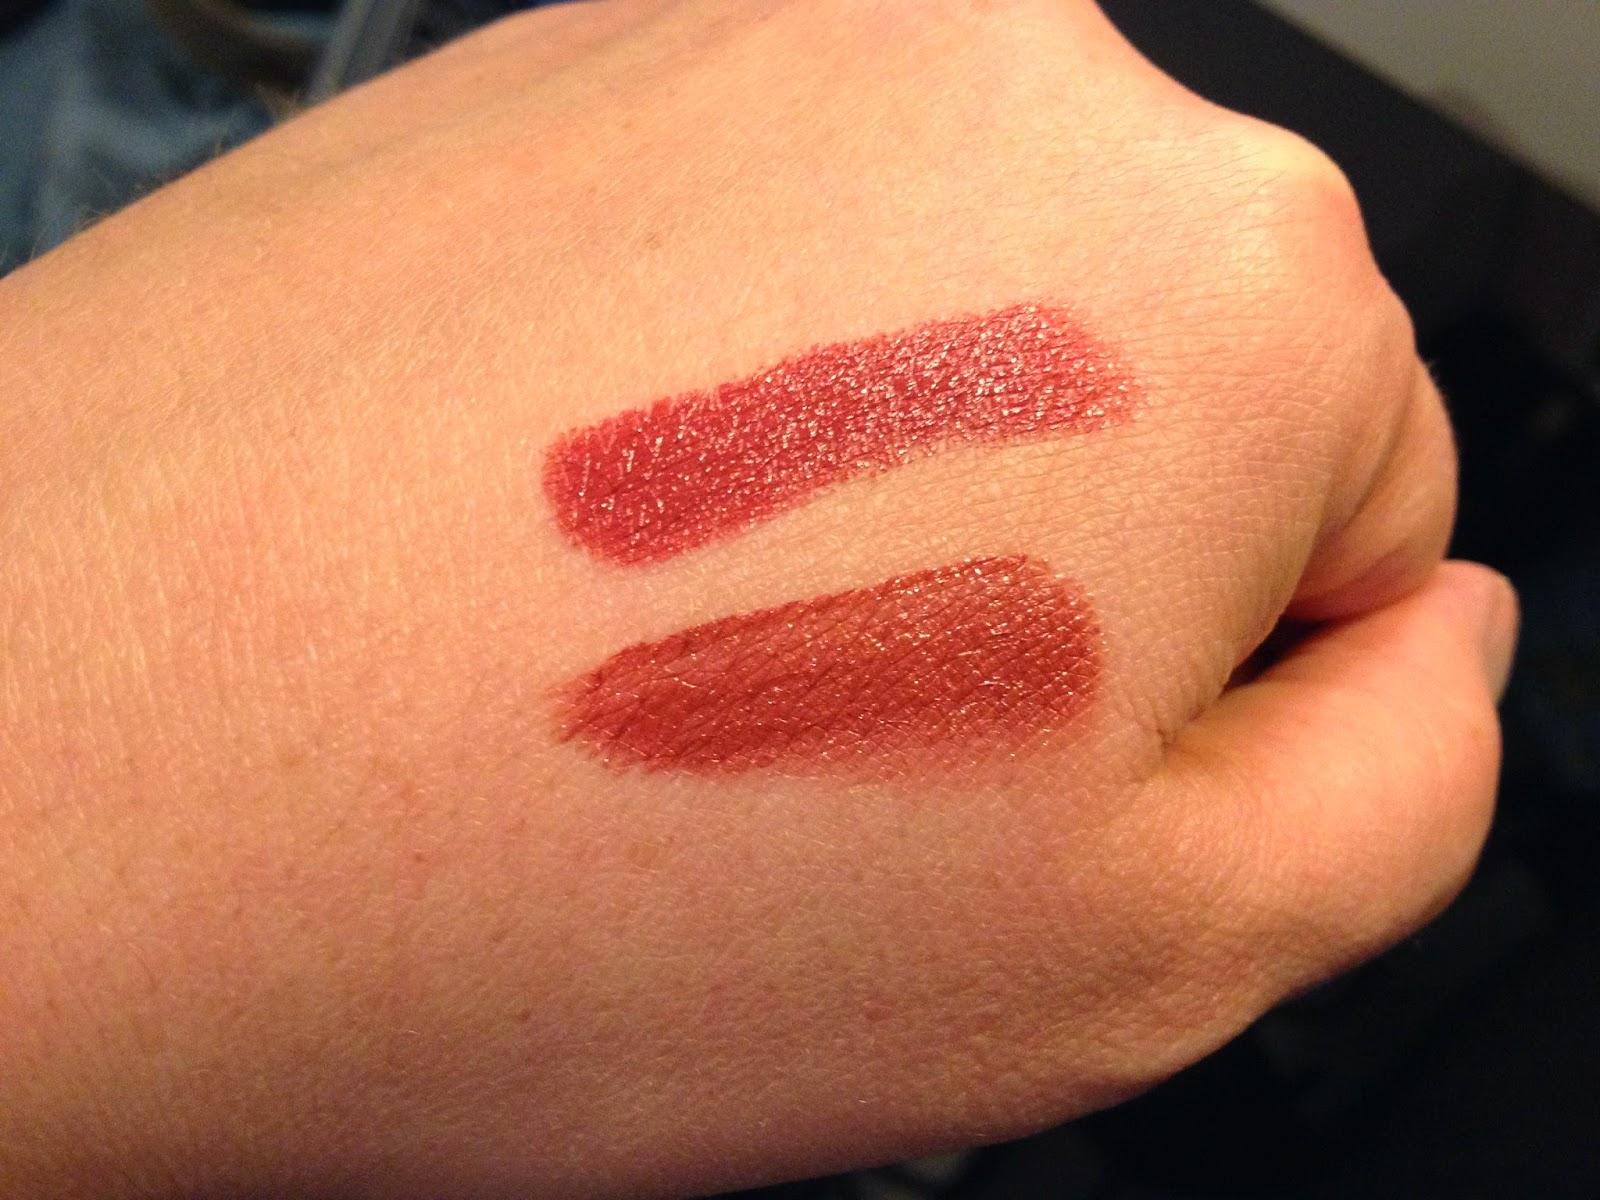 L'Oreal Infallible 24HR Lip Colour - Incessant Russet swatch vs MAC Brick-O-La Lipstick